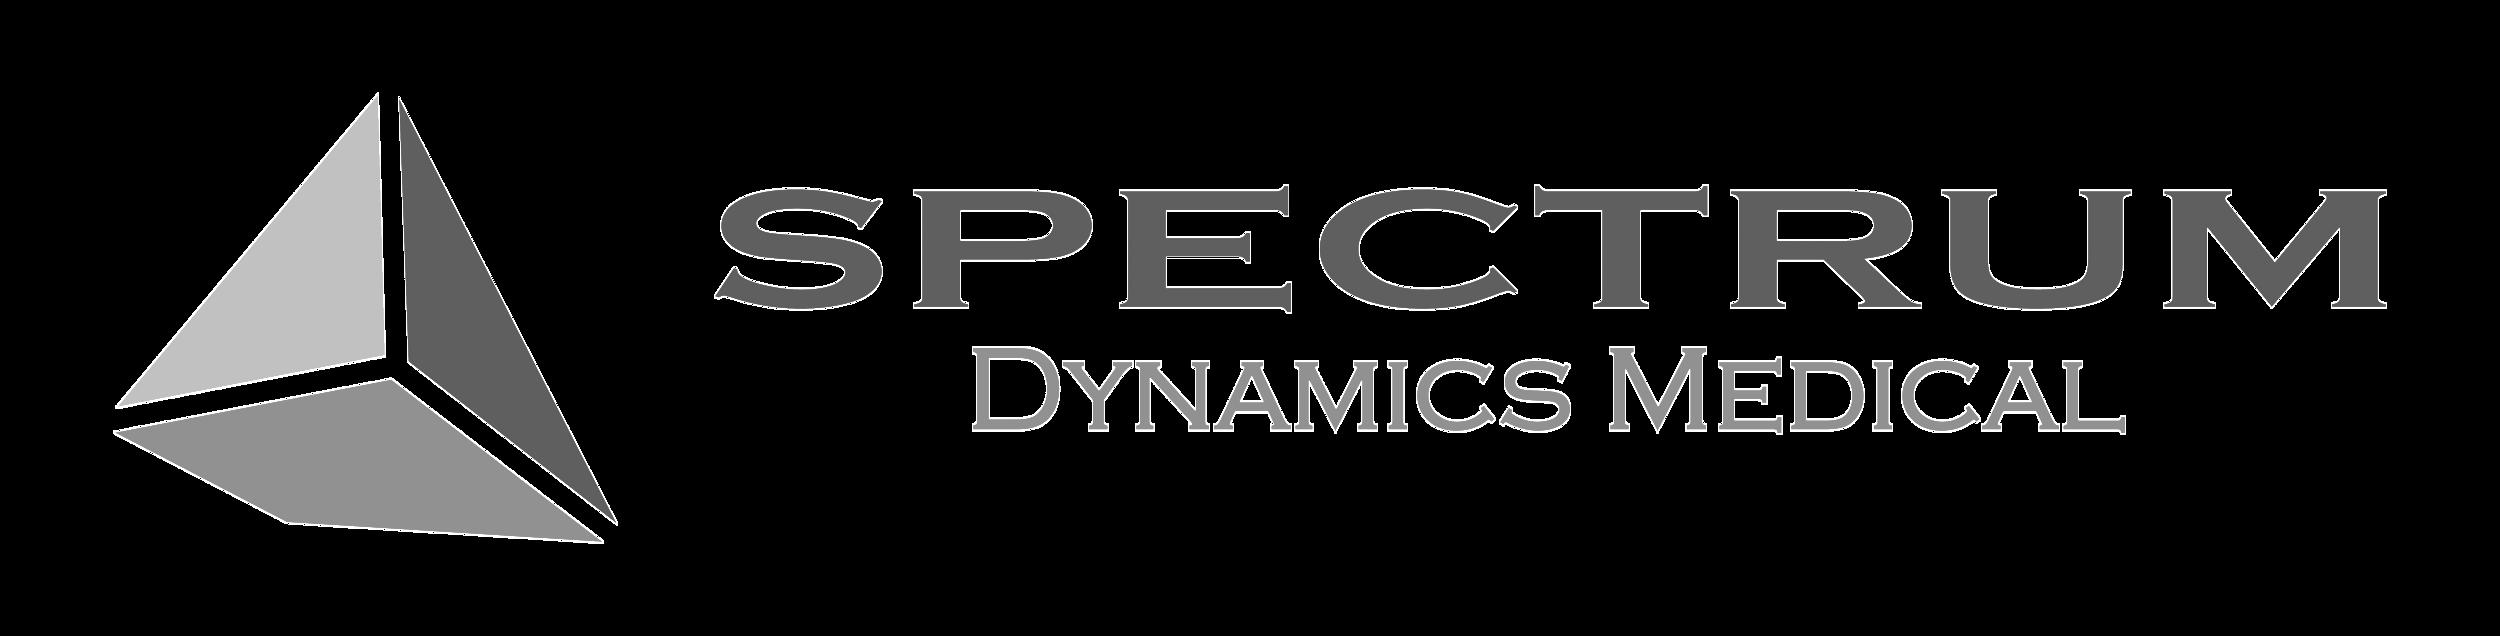 Spectrum-Dynamics-Medical-Logo-High-Res.png